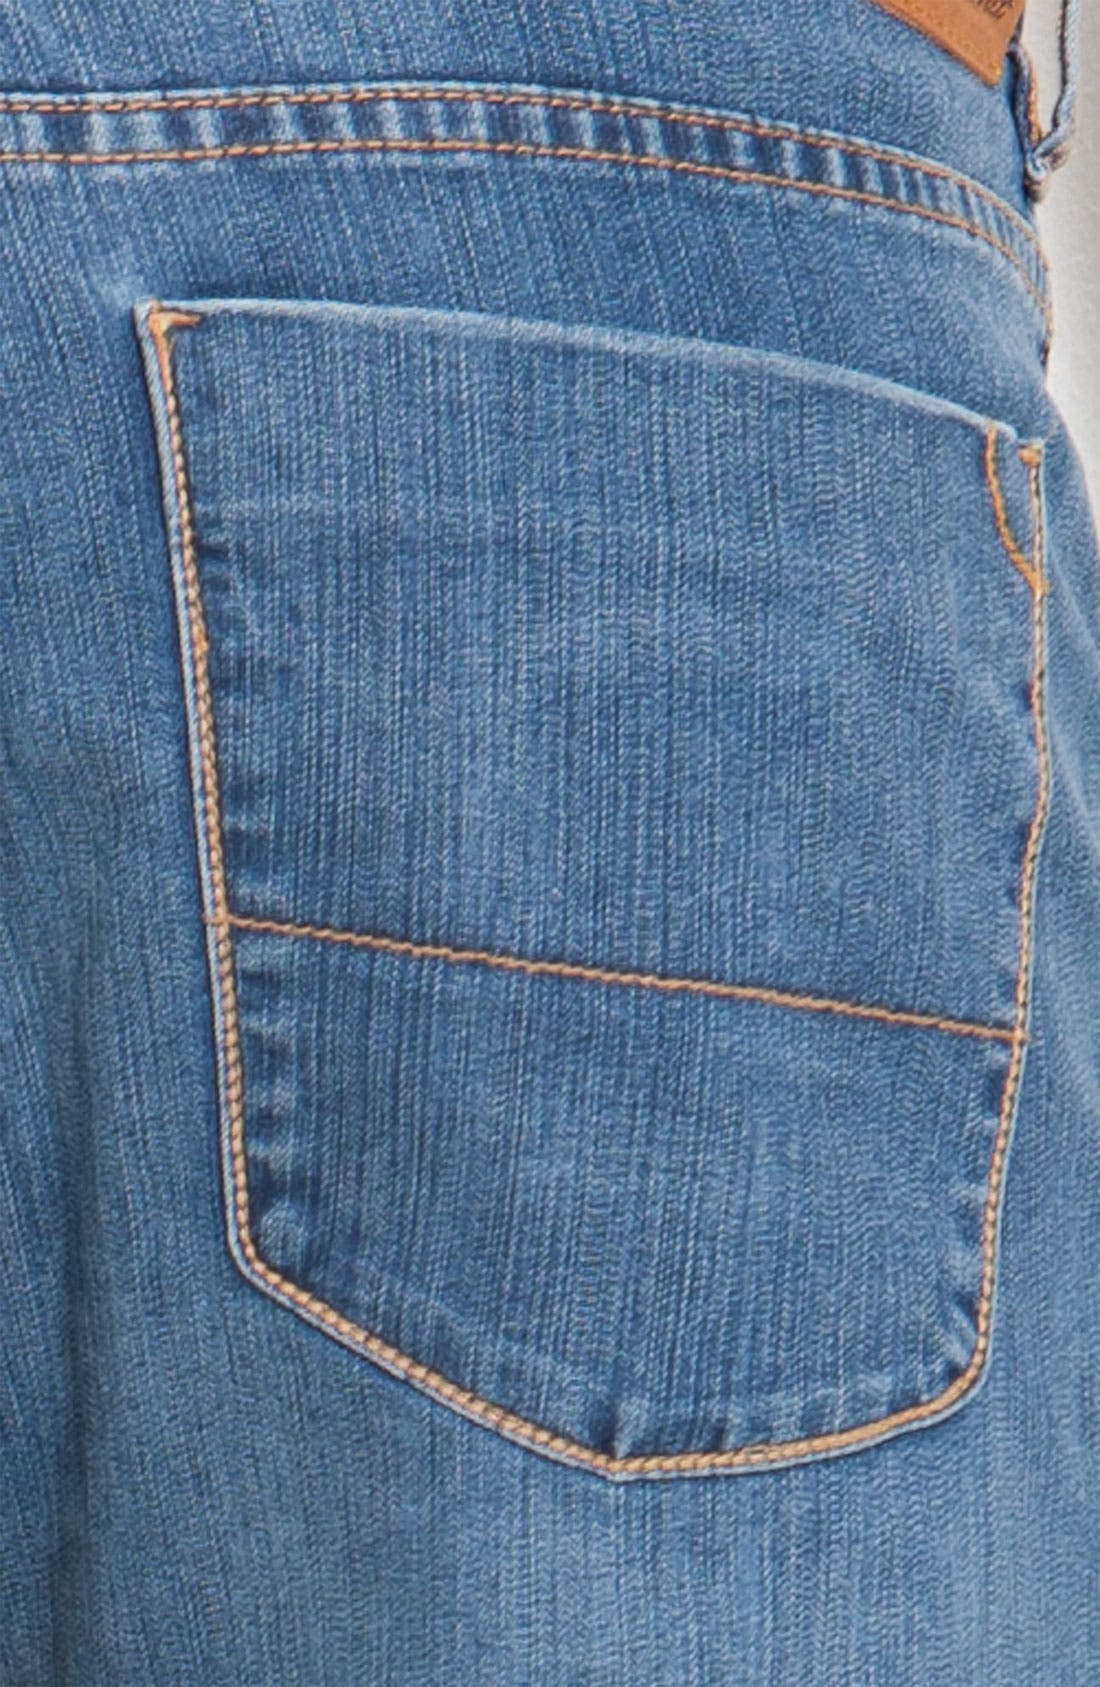 Alternate Image 3  - Tommy Bahama Denim 'Calo' Standard Jeans (Medium Worn)(Big & Tall)